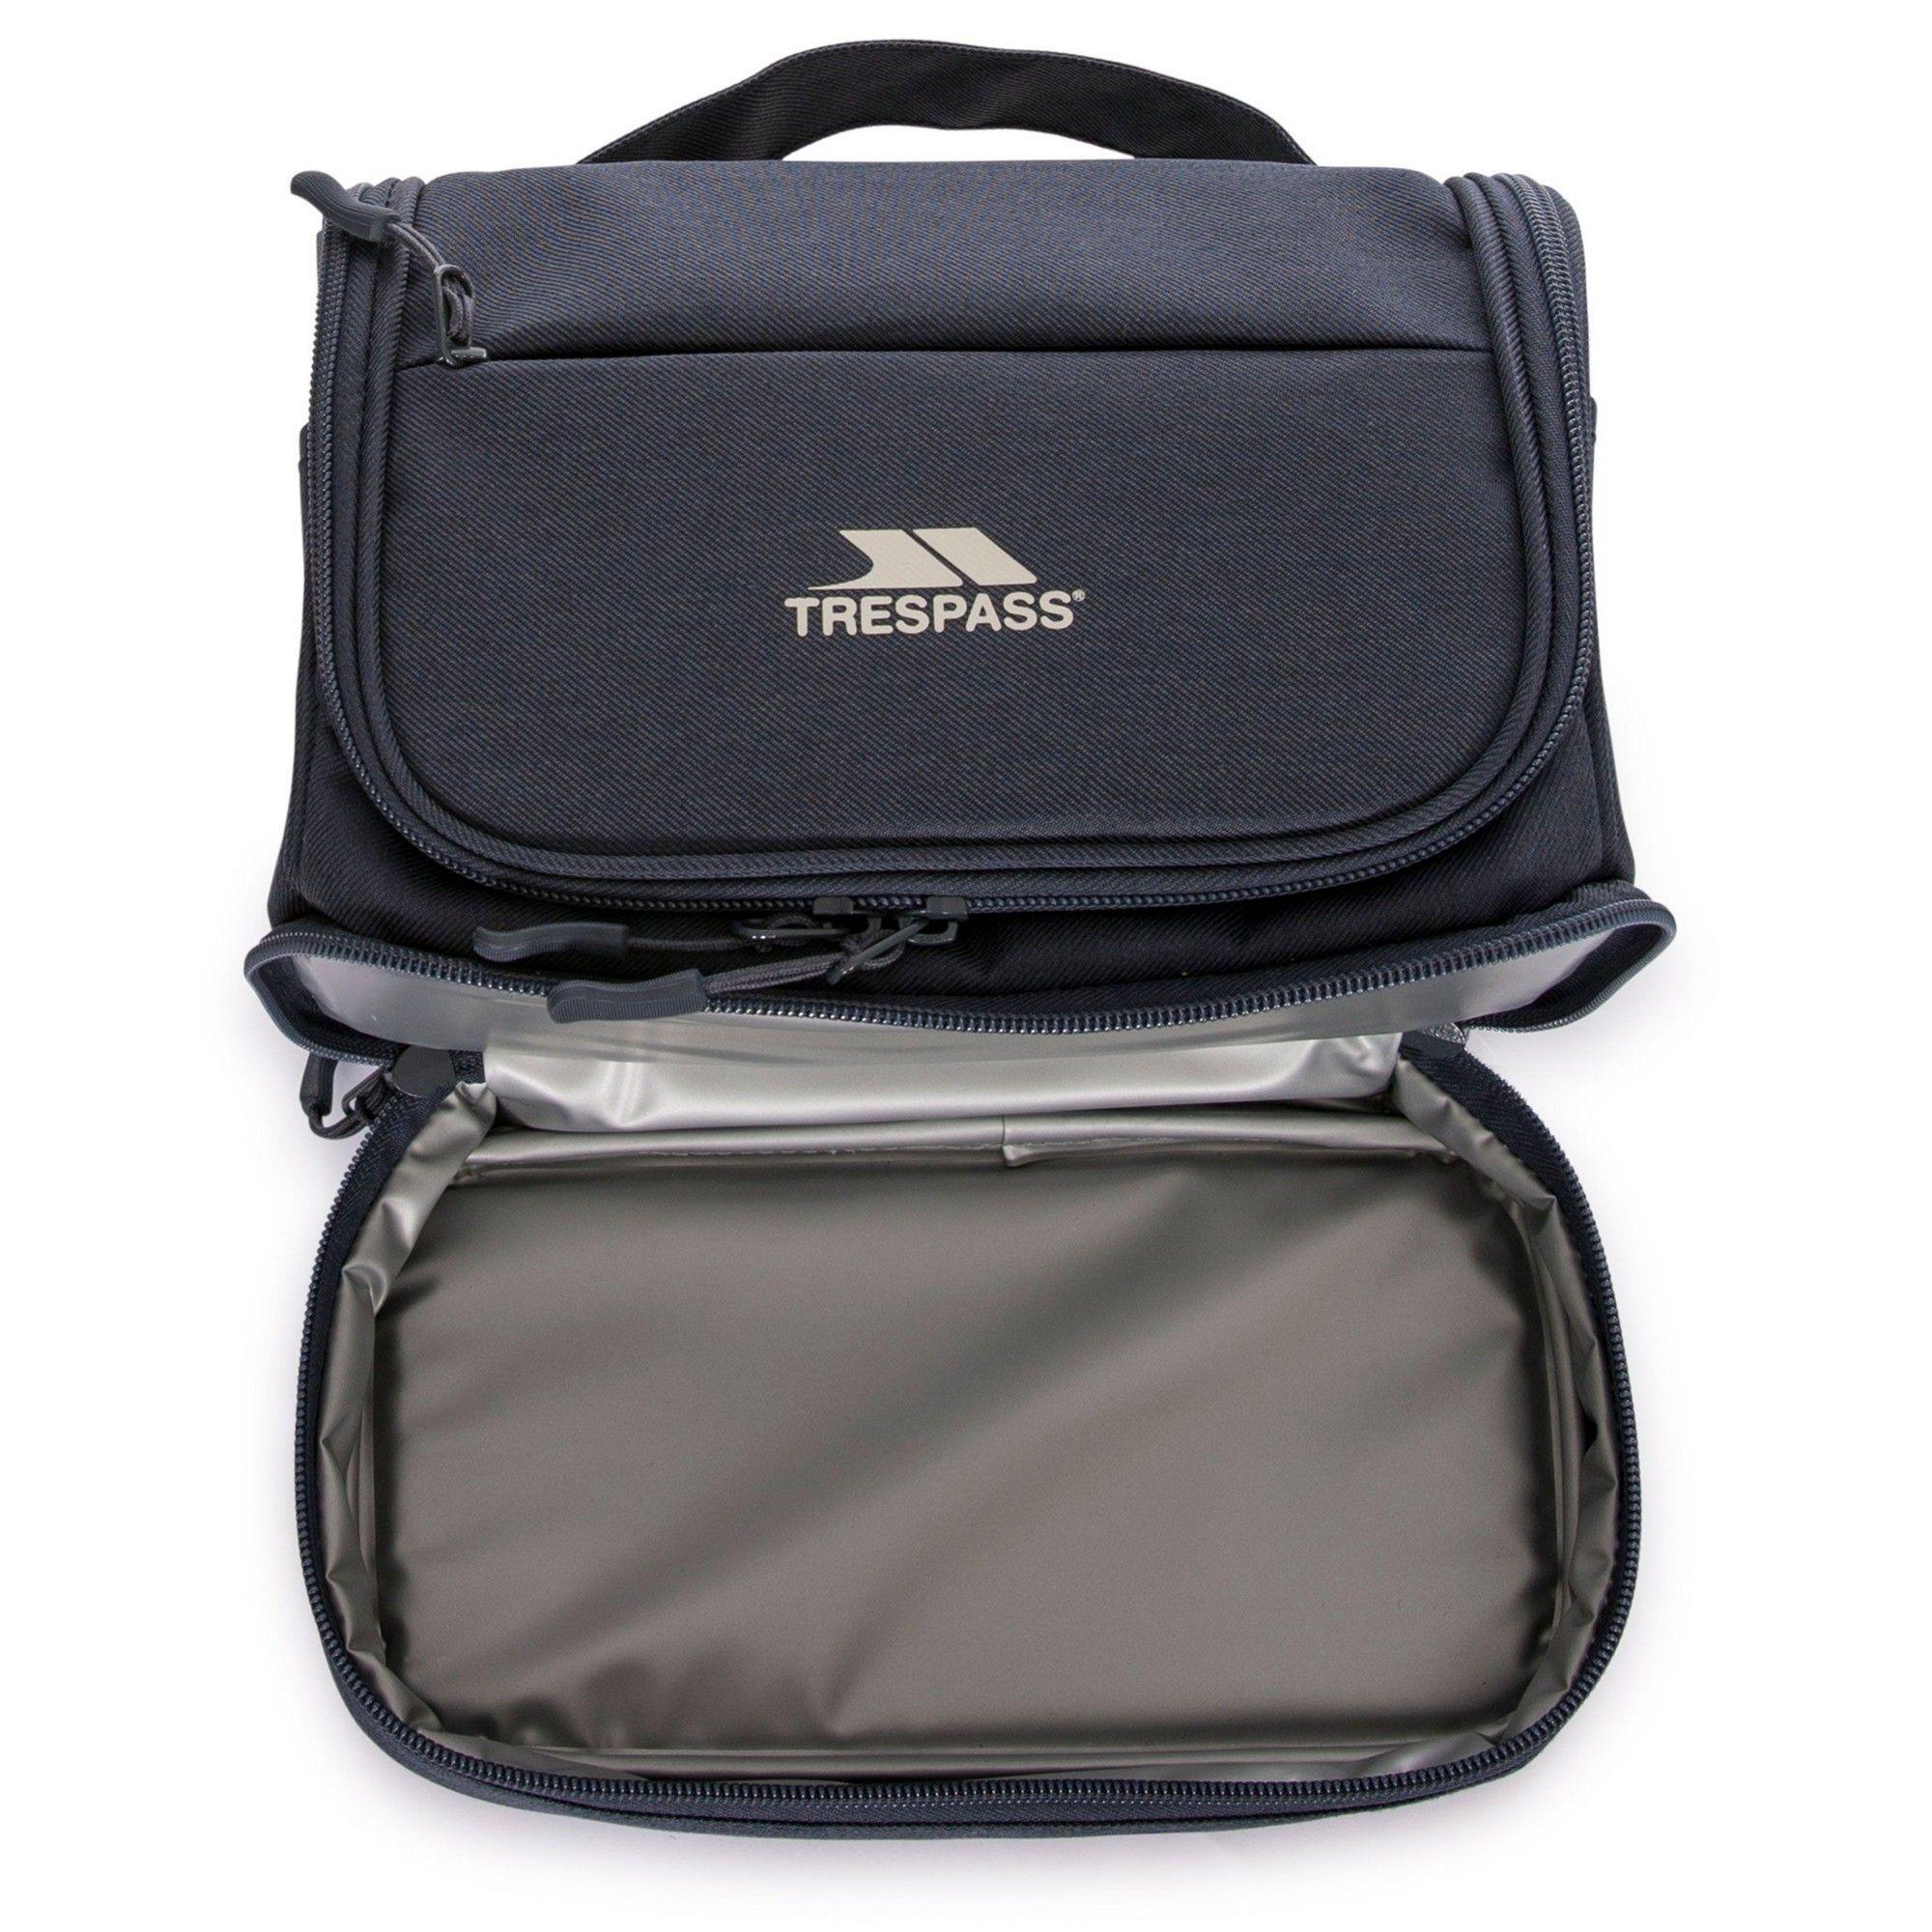 Trespass Washa Toiletry Bag (Navy)